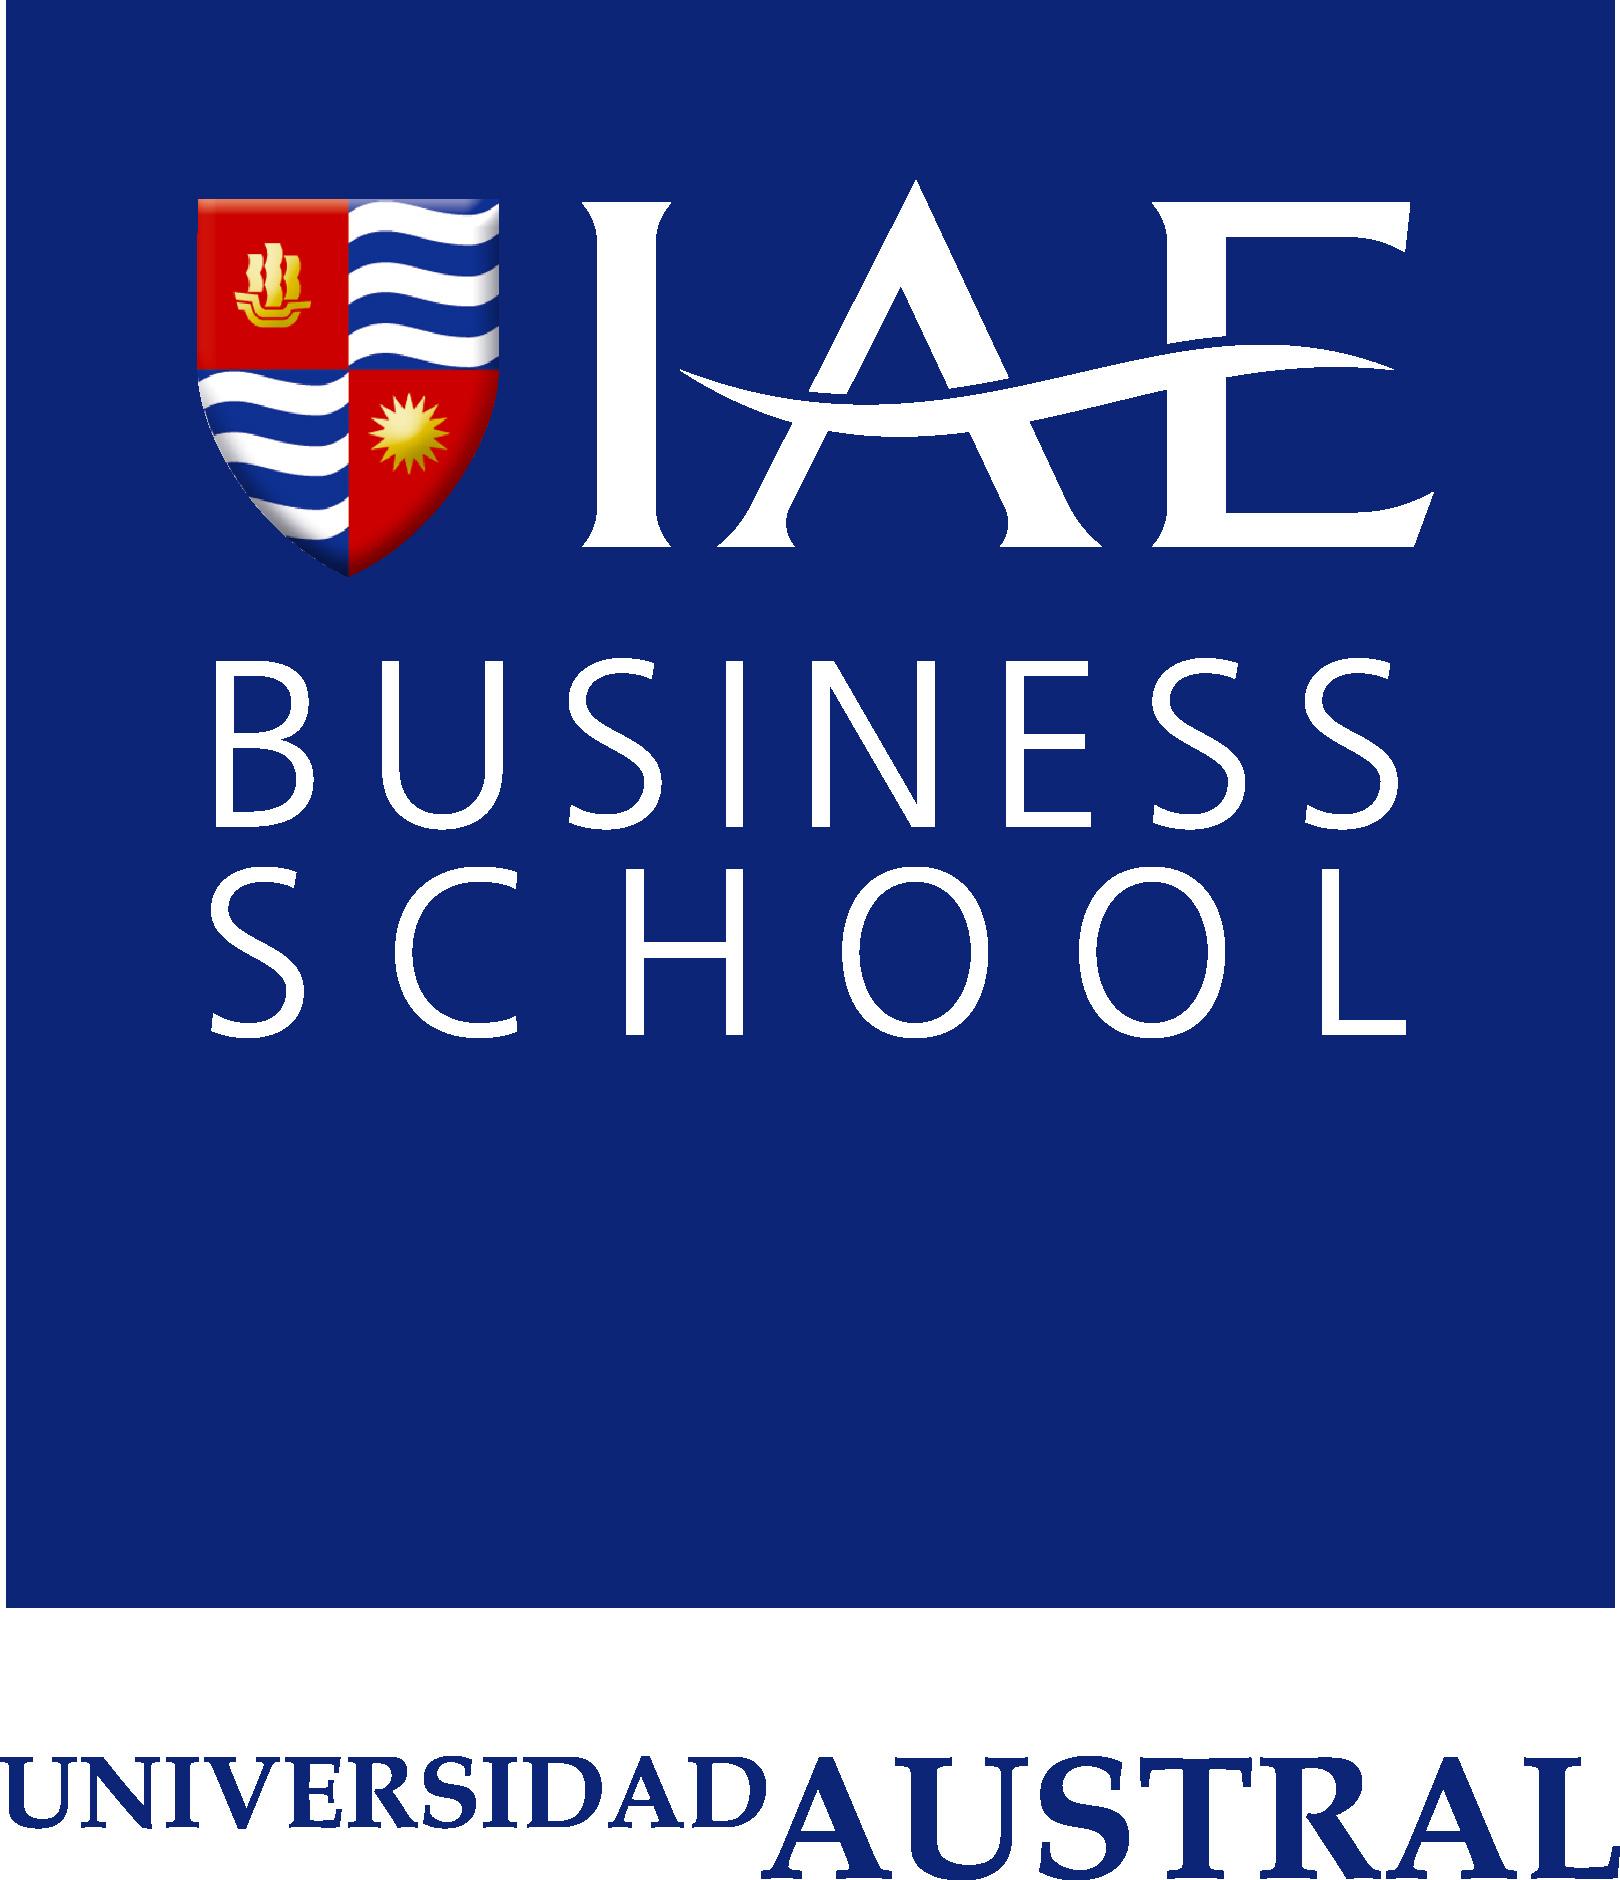 Logo Universidad Austral - IAE Business School